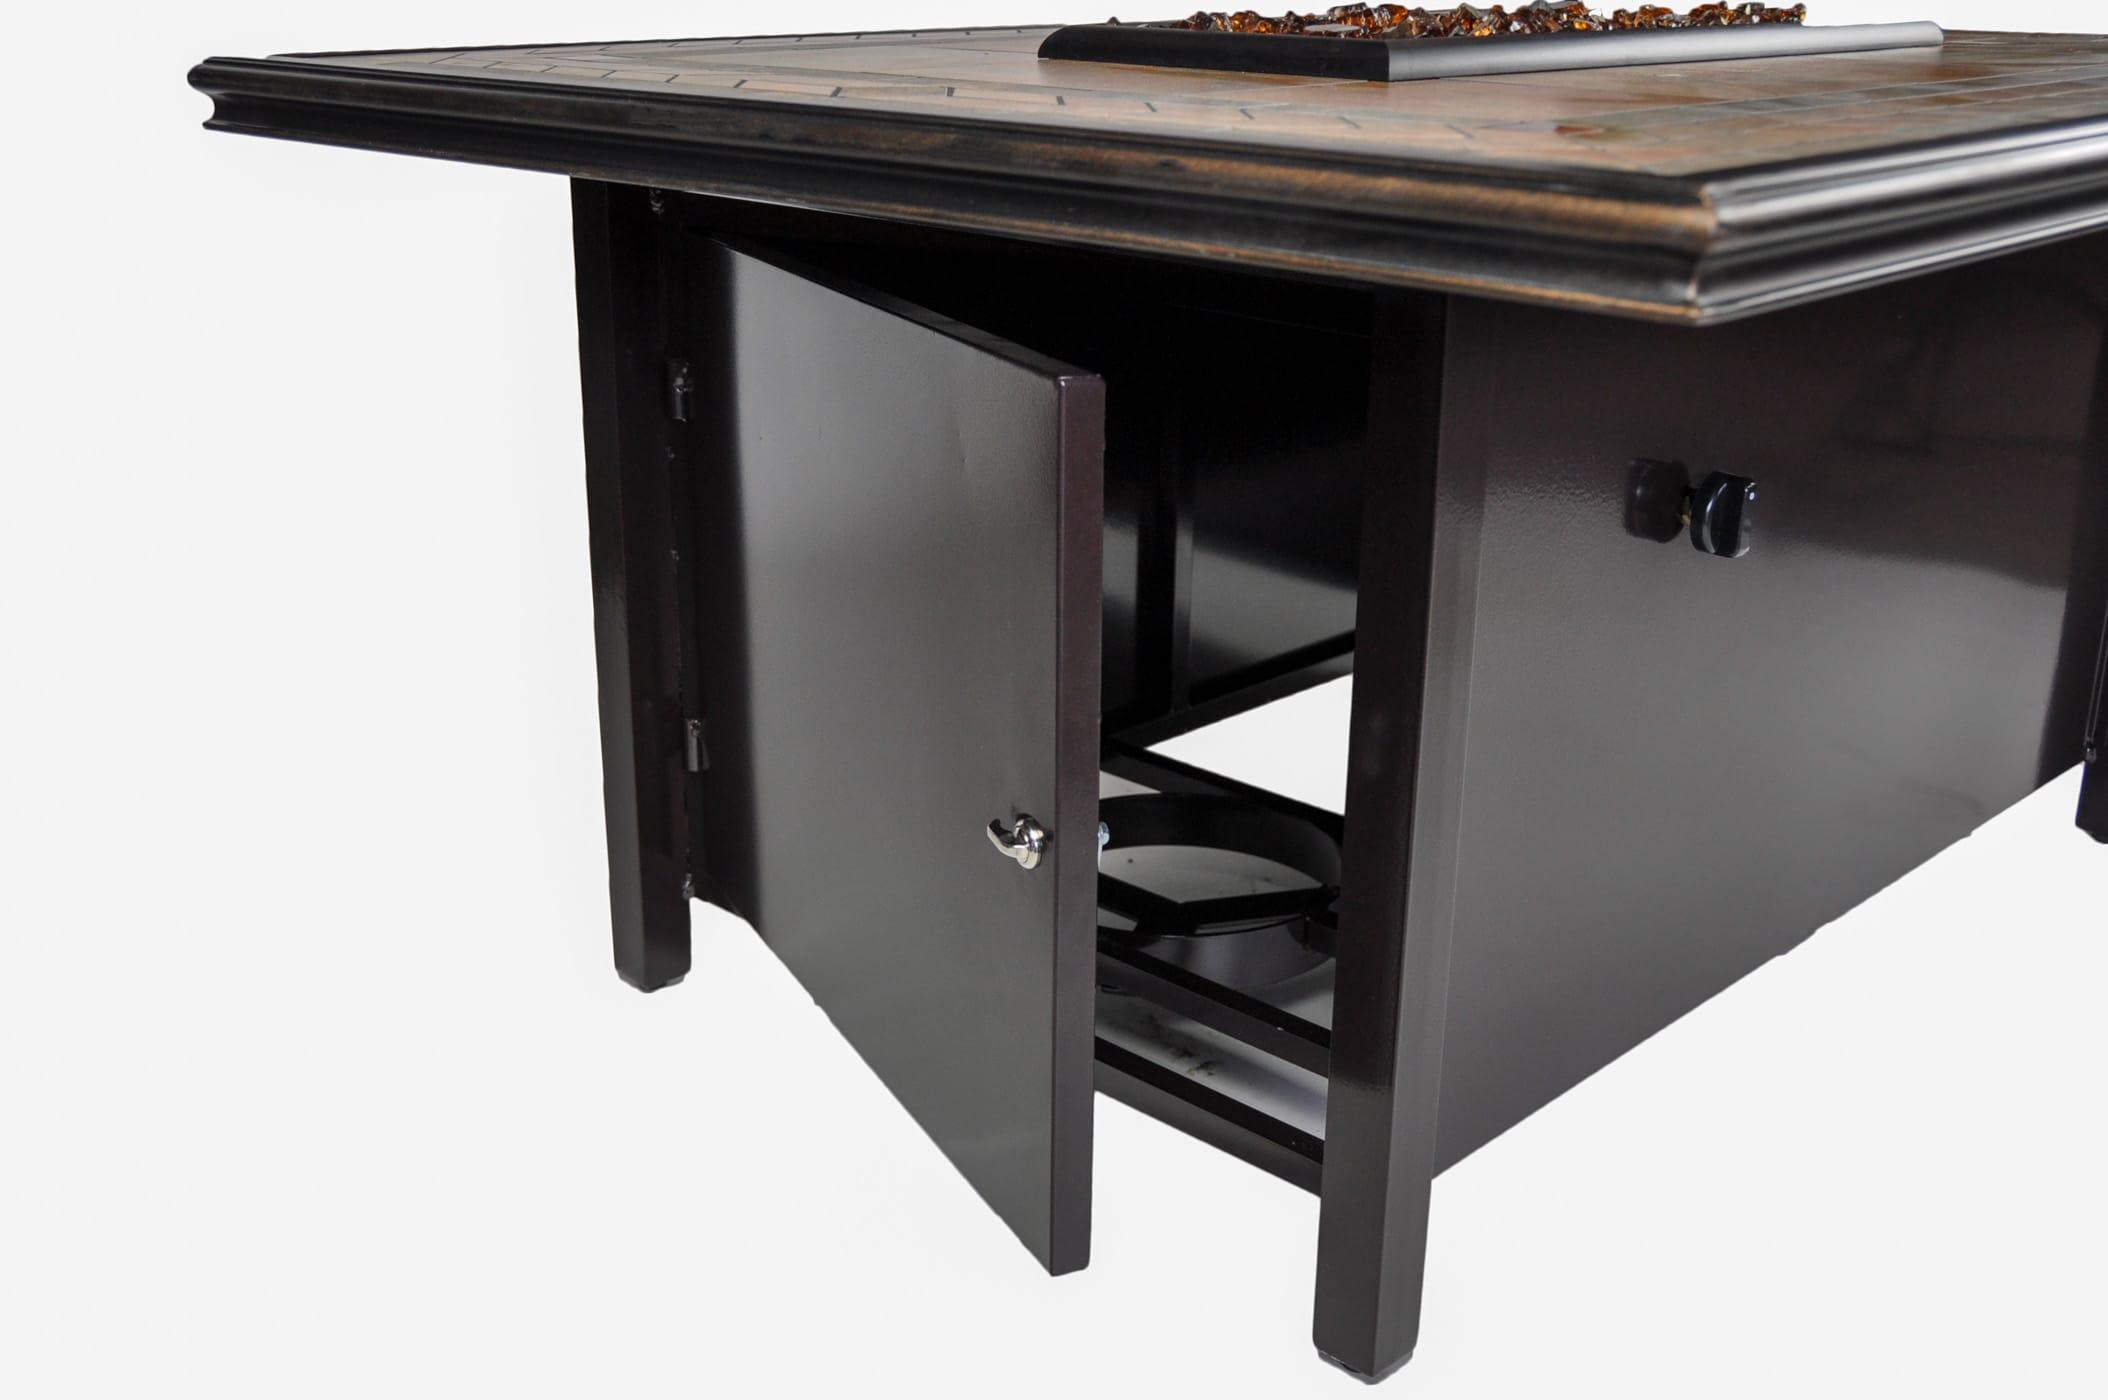 Tretco Panama 50 inch x 36 inch Fire Pit Table-Panama 50 inch x 36 pic 2.jpg